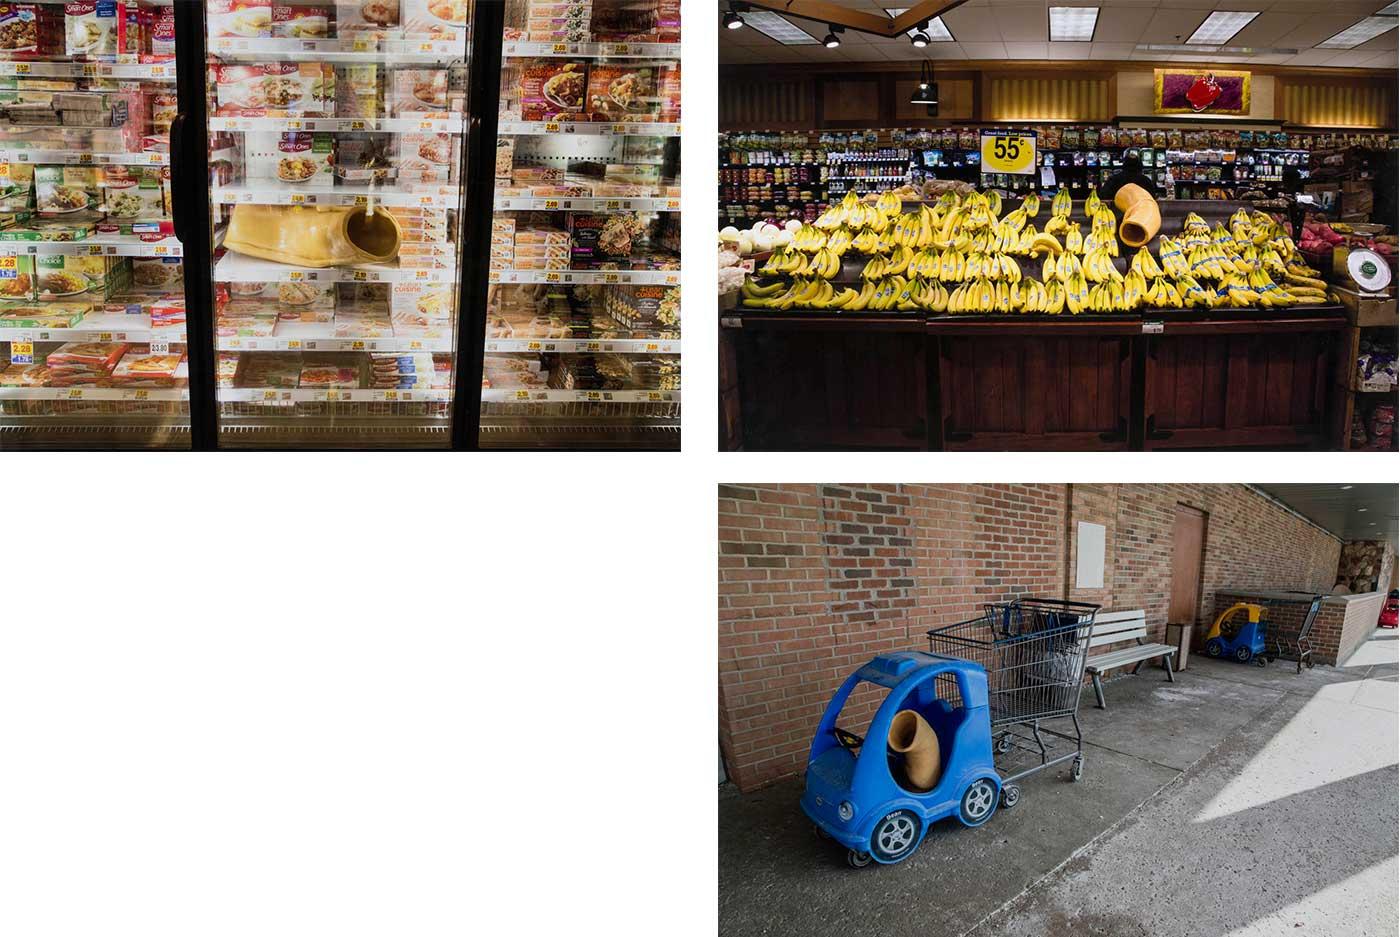 Sara Nishikawa - Groceries at Kroger (trying to blend in)